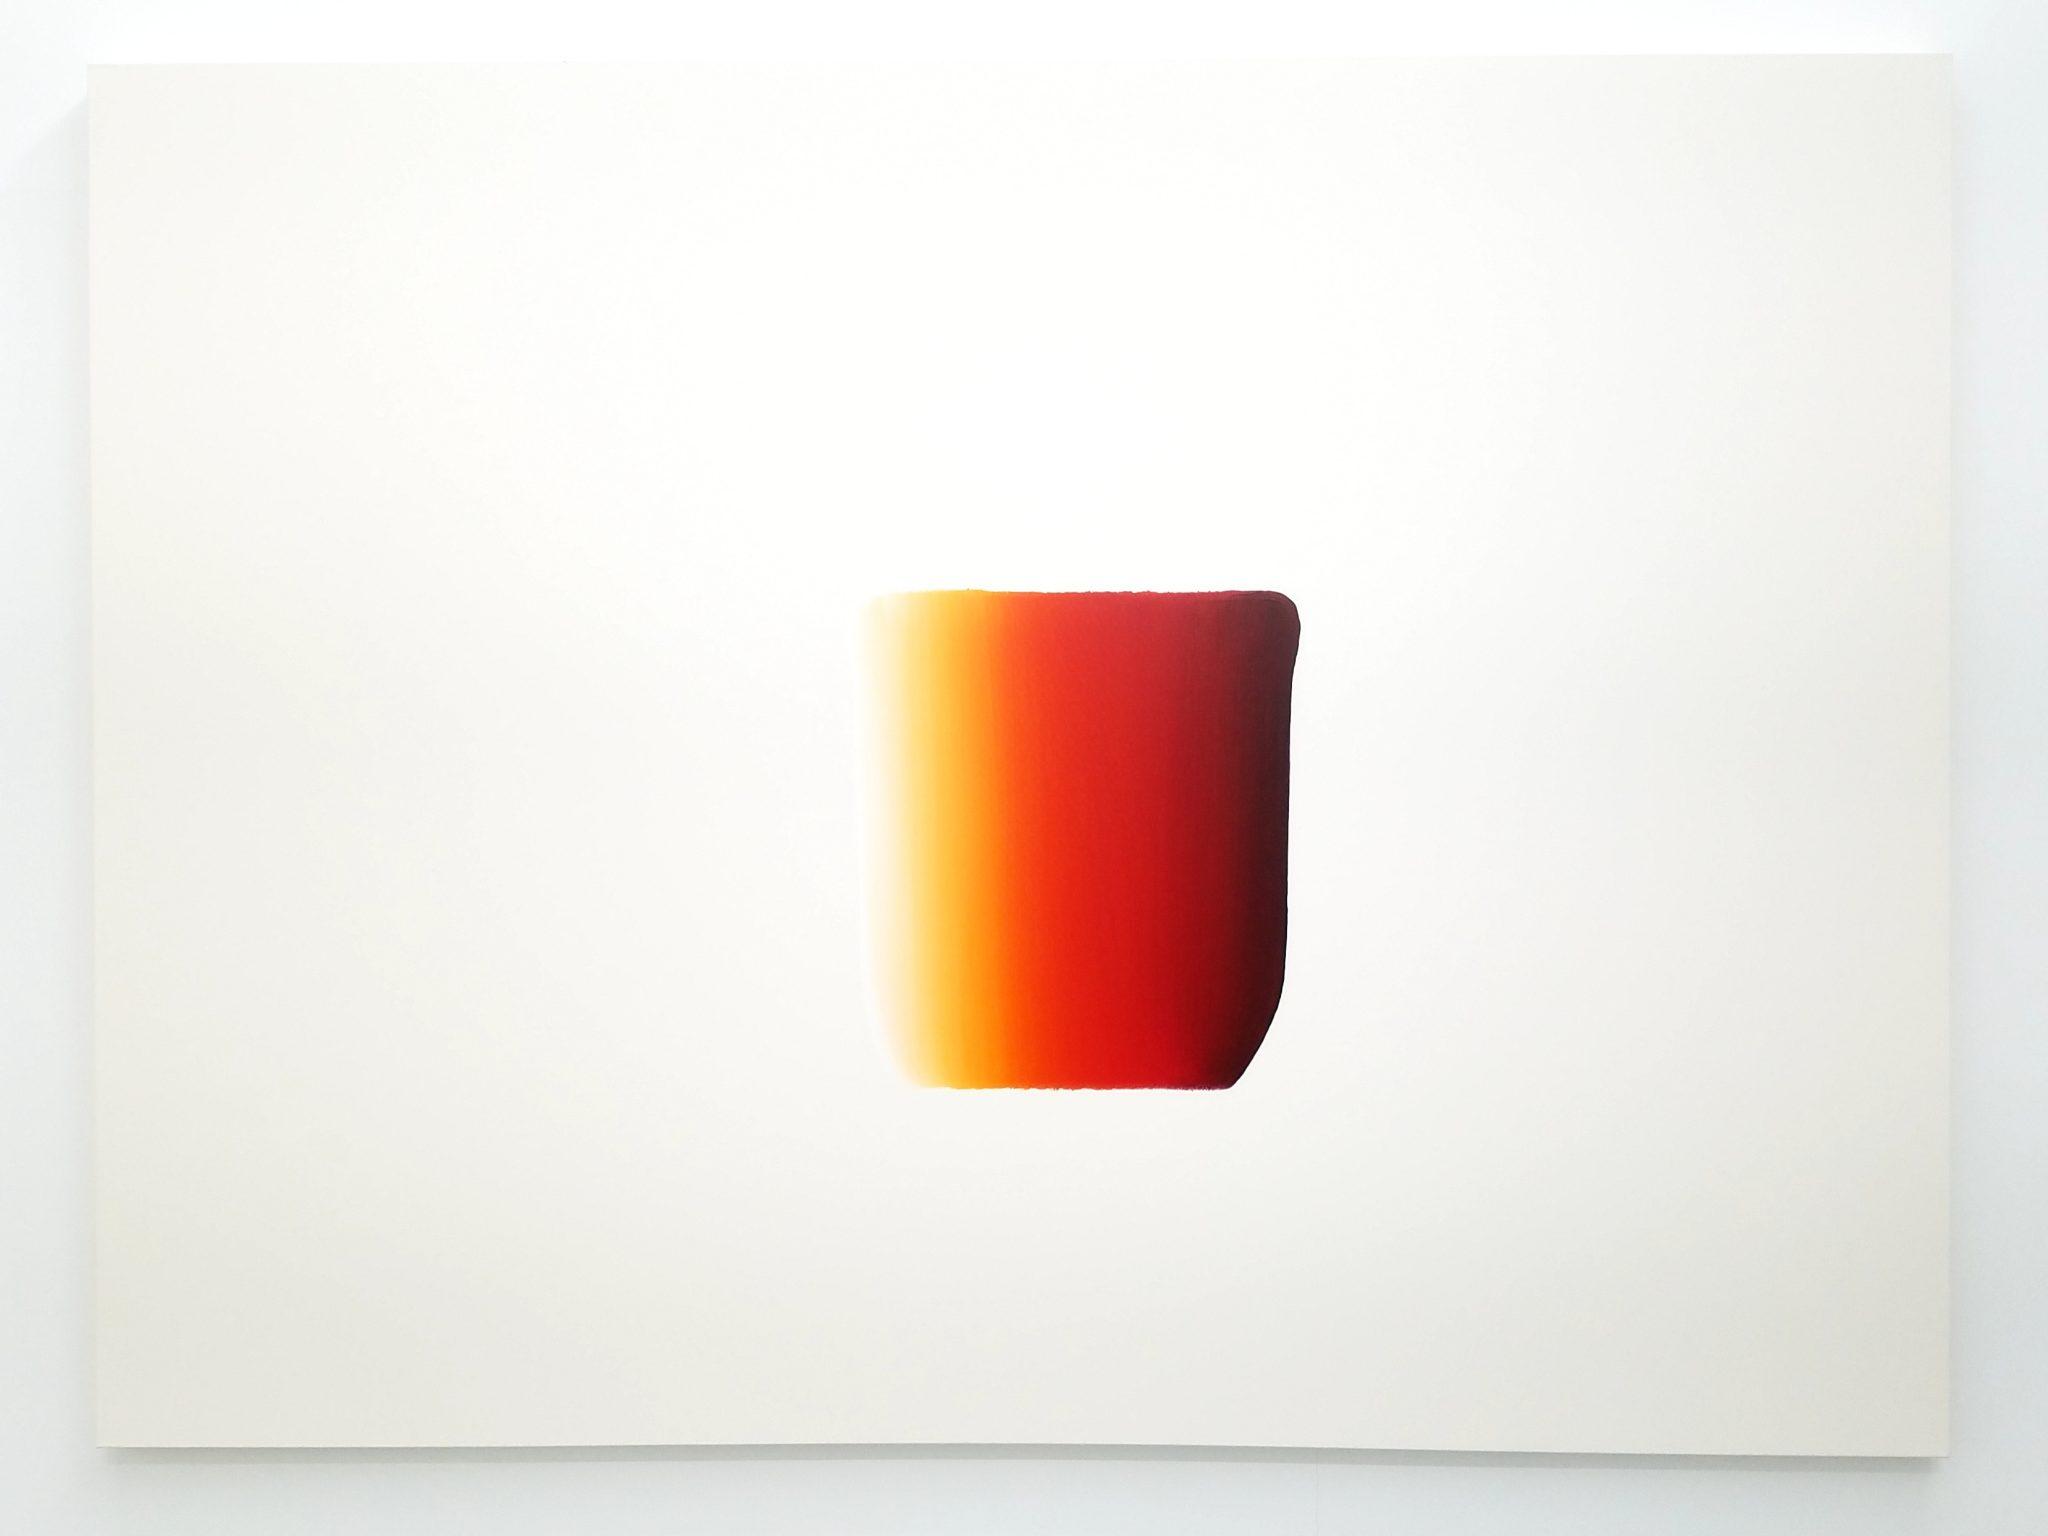 Lee Ufan, 'Dialogue' (2017), Acrylic on Canvas on display at SCAI the Bathhouse, Yanaka